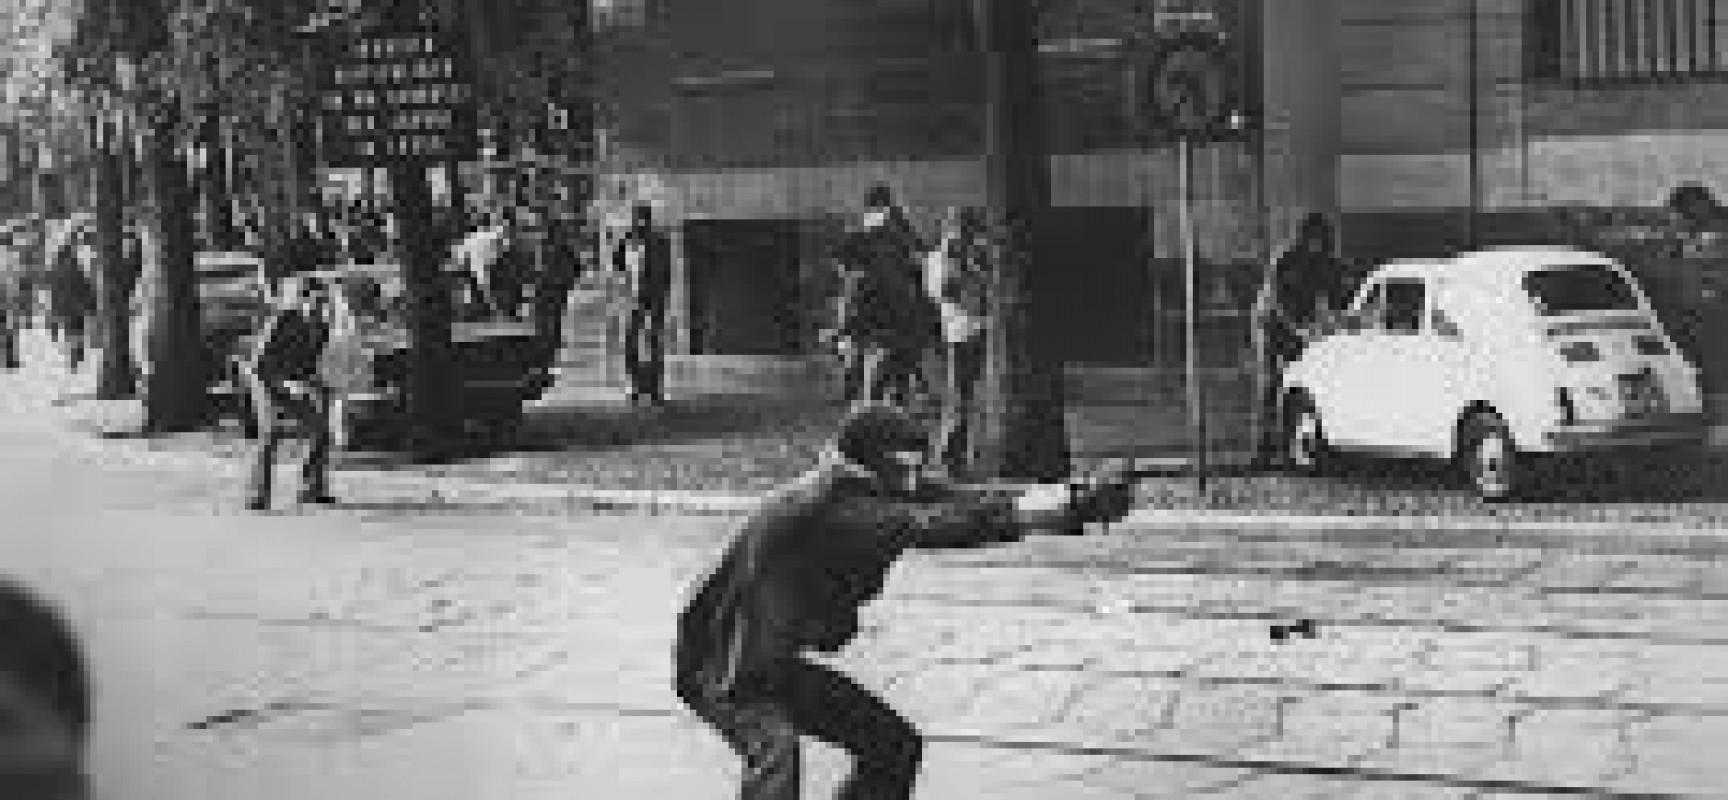 Manifestare in piazza - Pagina 2 Pedrizzetti-1728x800_c